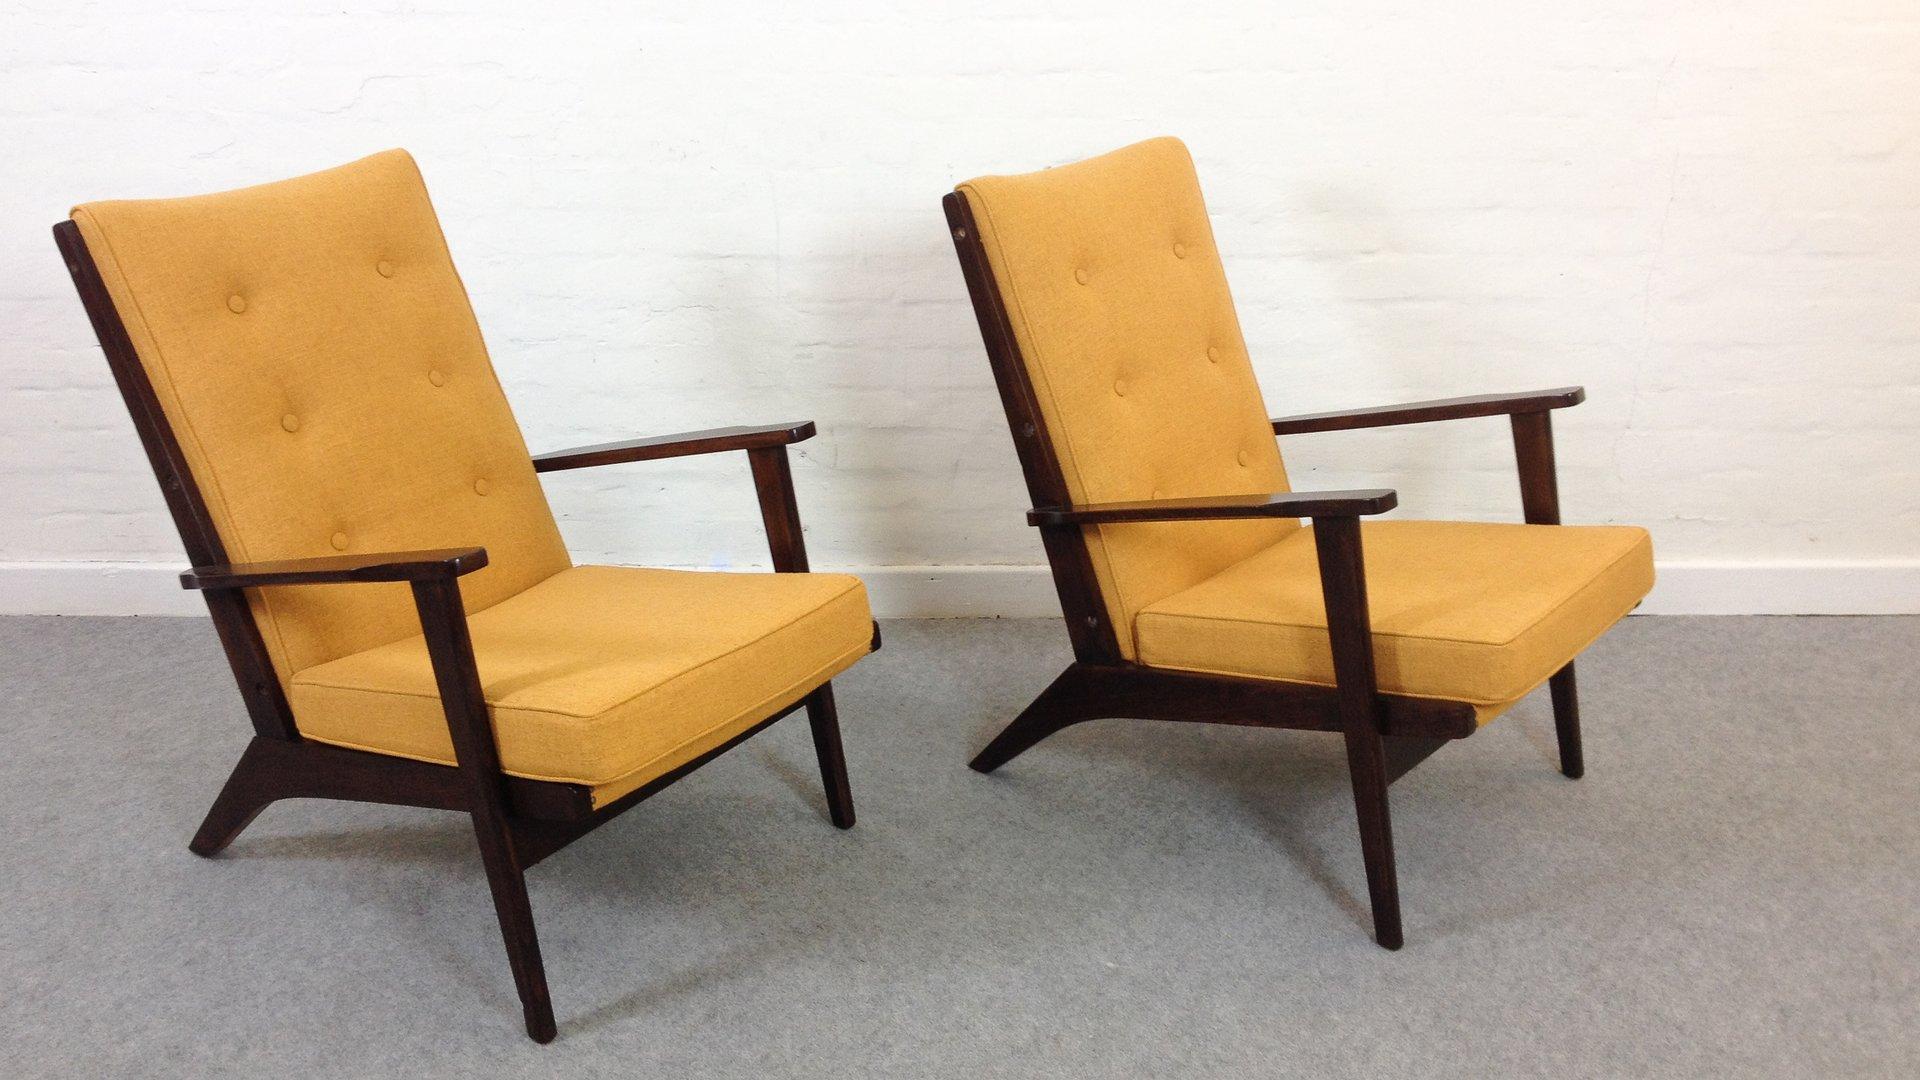 mid century sessel in senfgelb von parker knoll 1950er 2er set bei pamono kaufen. Black Bedroom Furniture Sets. Home Design Ideas